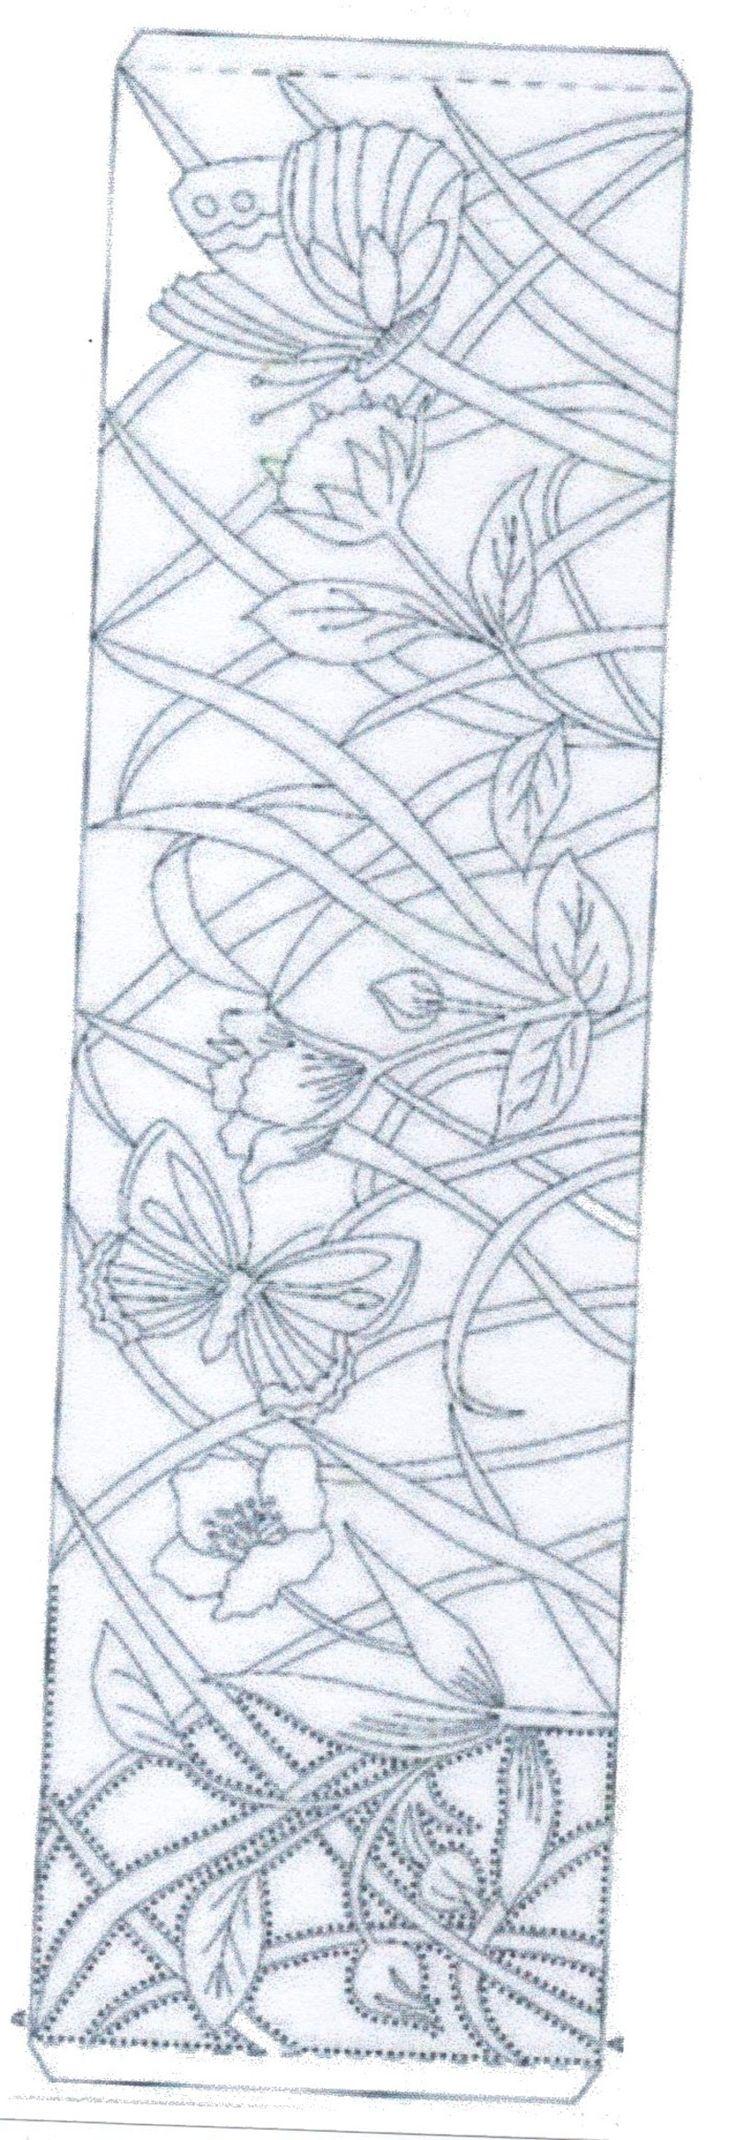 1517 best images about pergamano parchmemt crafts on pinterest free pattern parchment cards. Black Bedroom Furniture Sets. Home Design Ideas